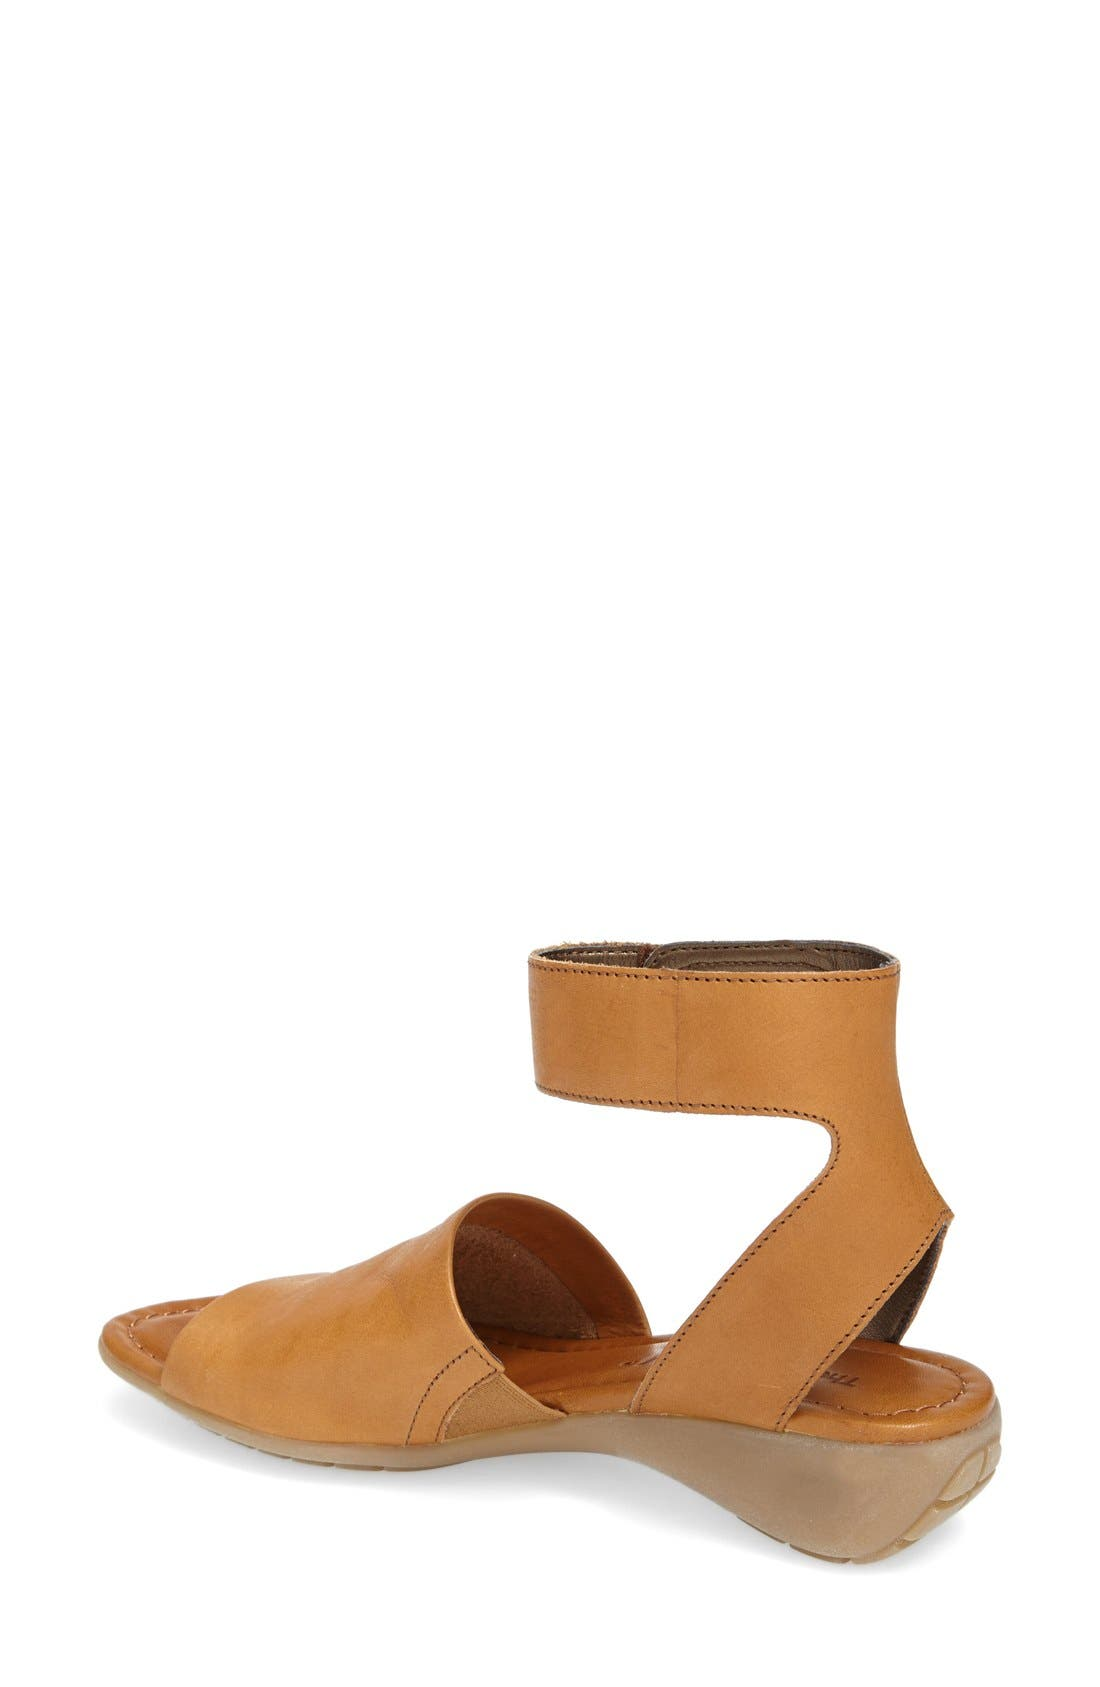 'Beglad' Leather Ankle Strap Sandal,                             Alternate thumbnail 27, color,